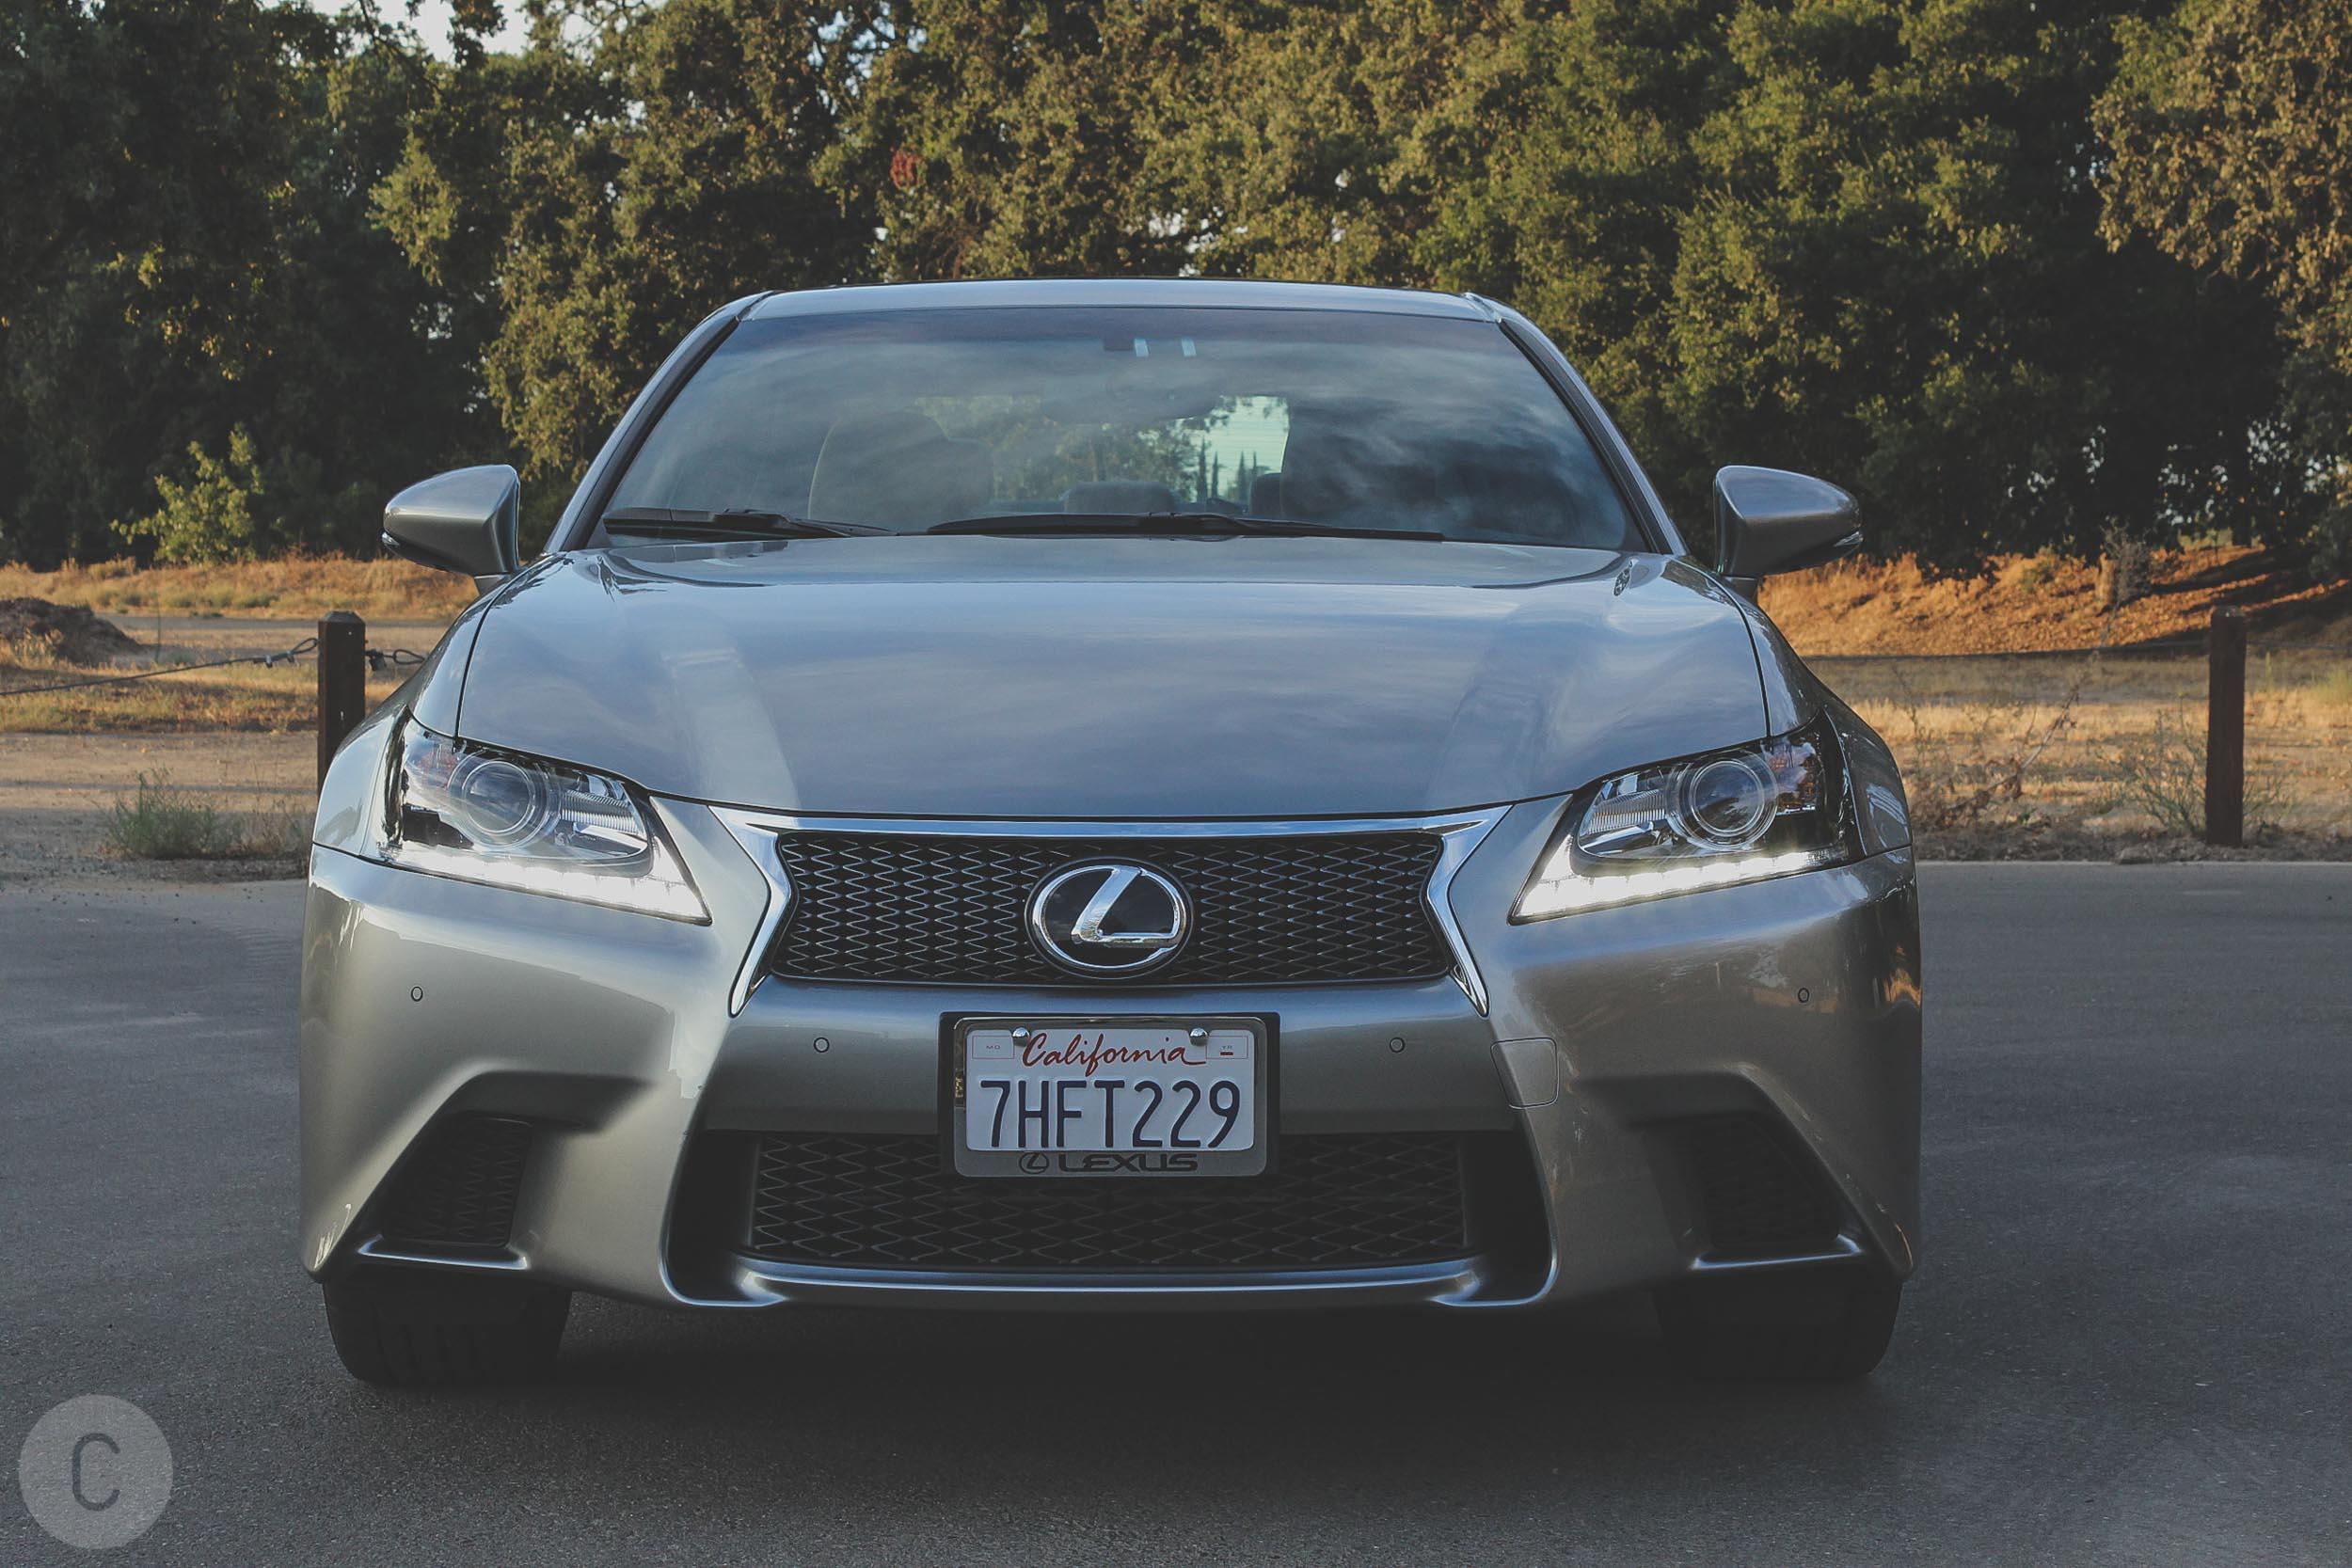 2015 Lexus GS 350 F SPORT • Carfanatics Blog